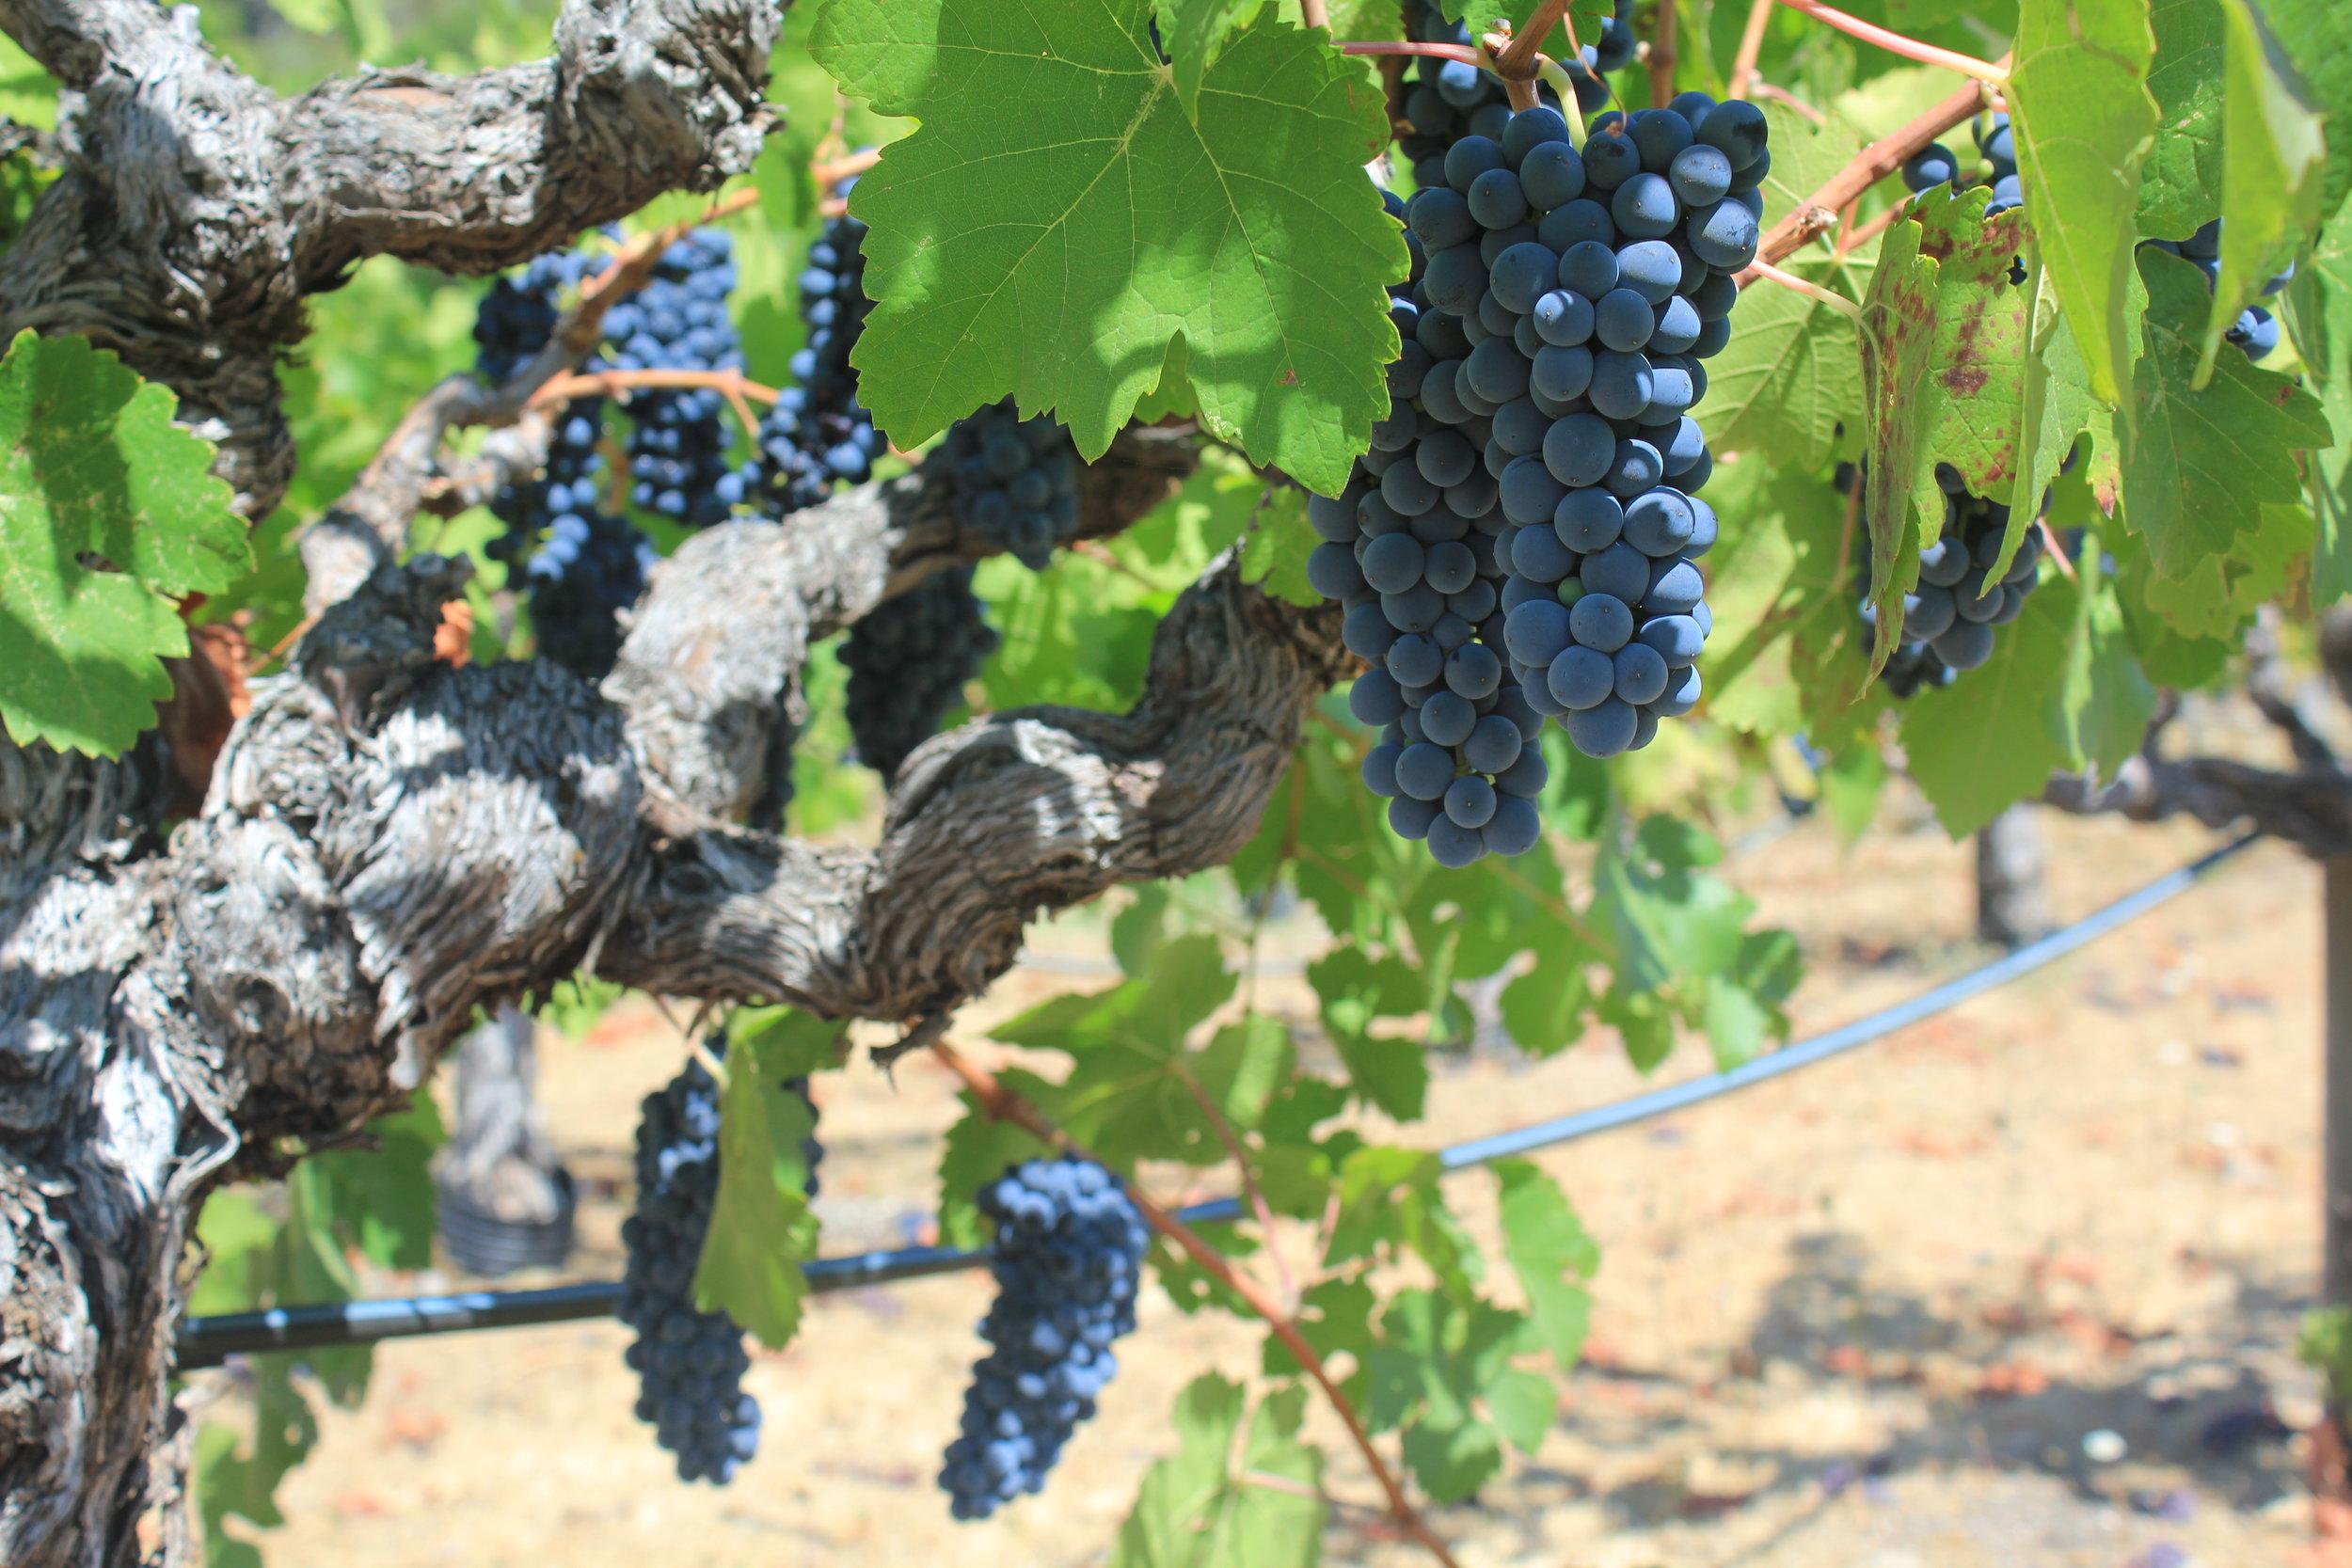 Blue-black clusters of Petite Sirah